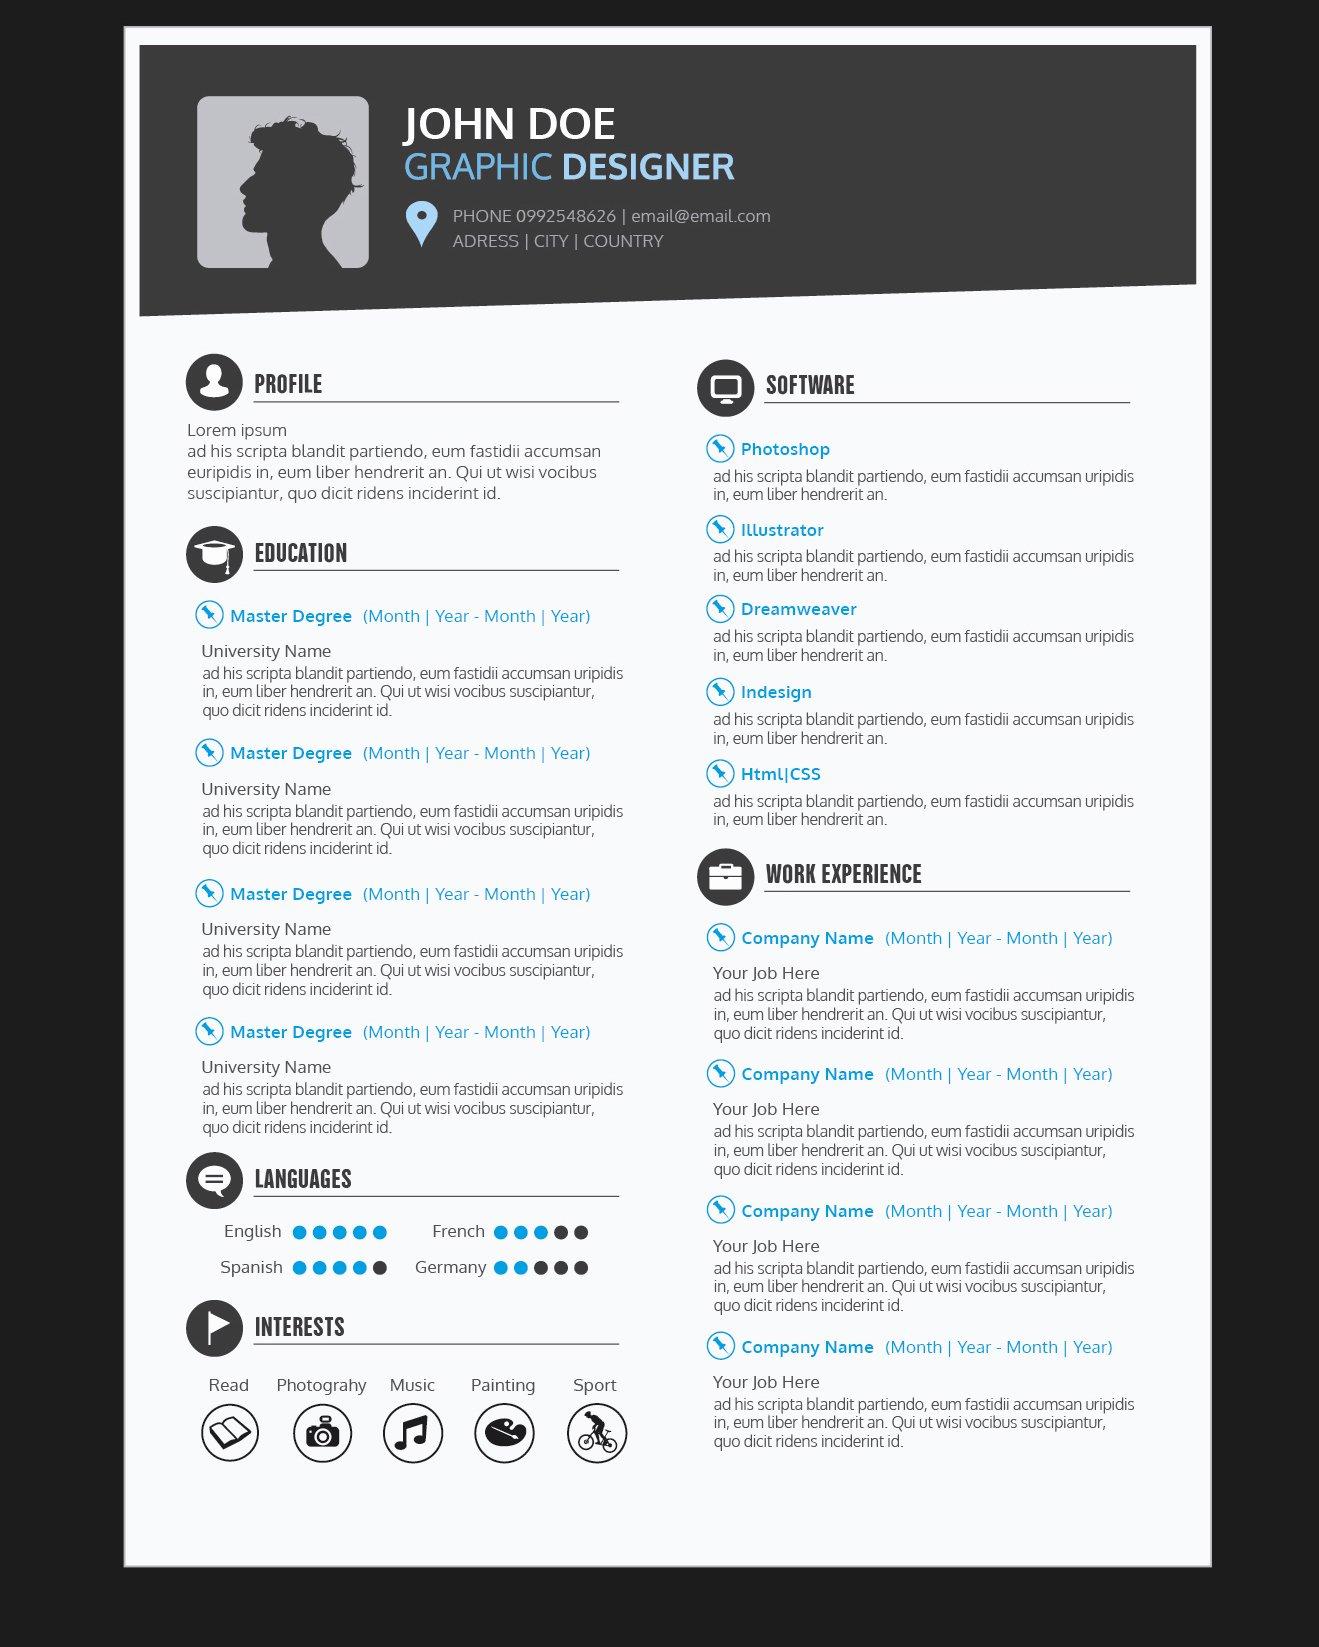 Web Designer Resume Template Awesome Graphic Designer Resume Cv Vector